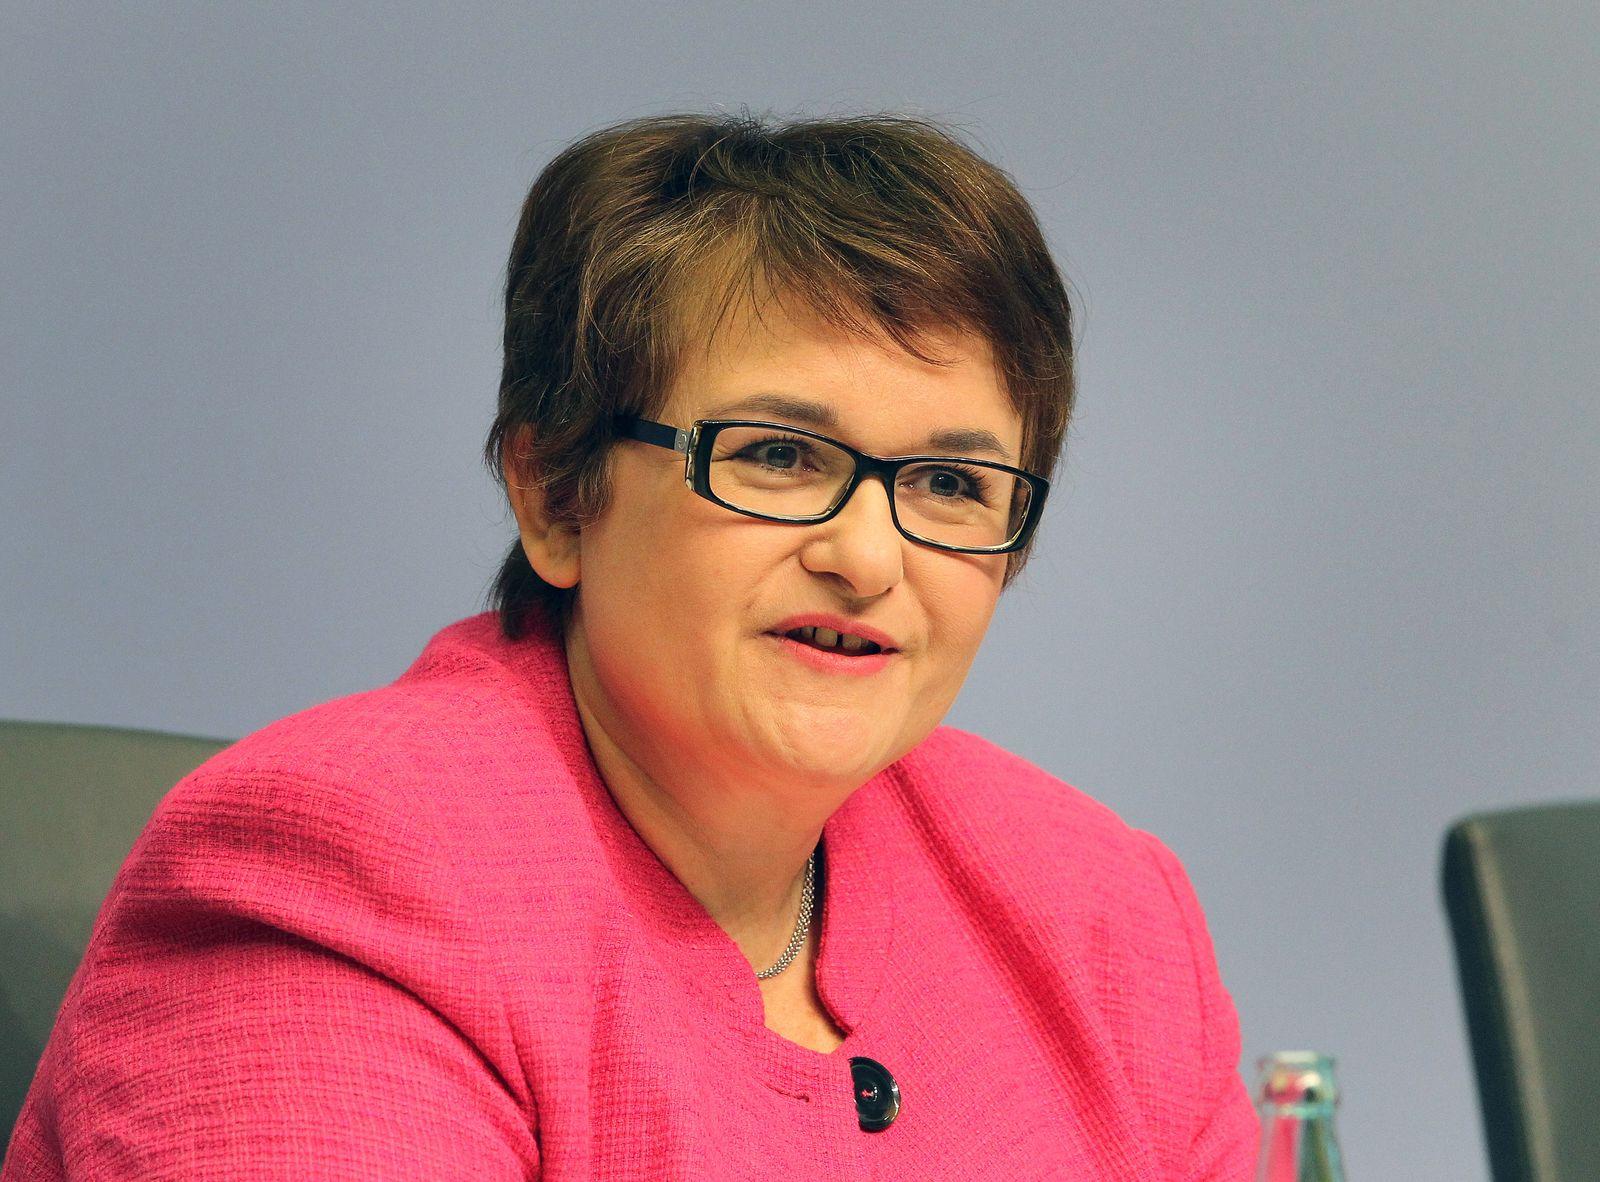 FILES-GERMANY-ECB-EU-EUROZONE-COUNCIL